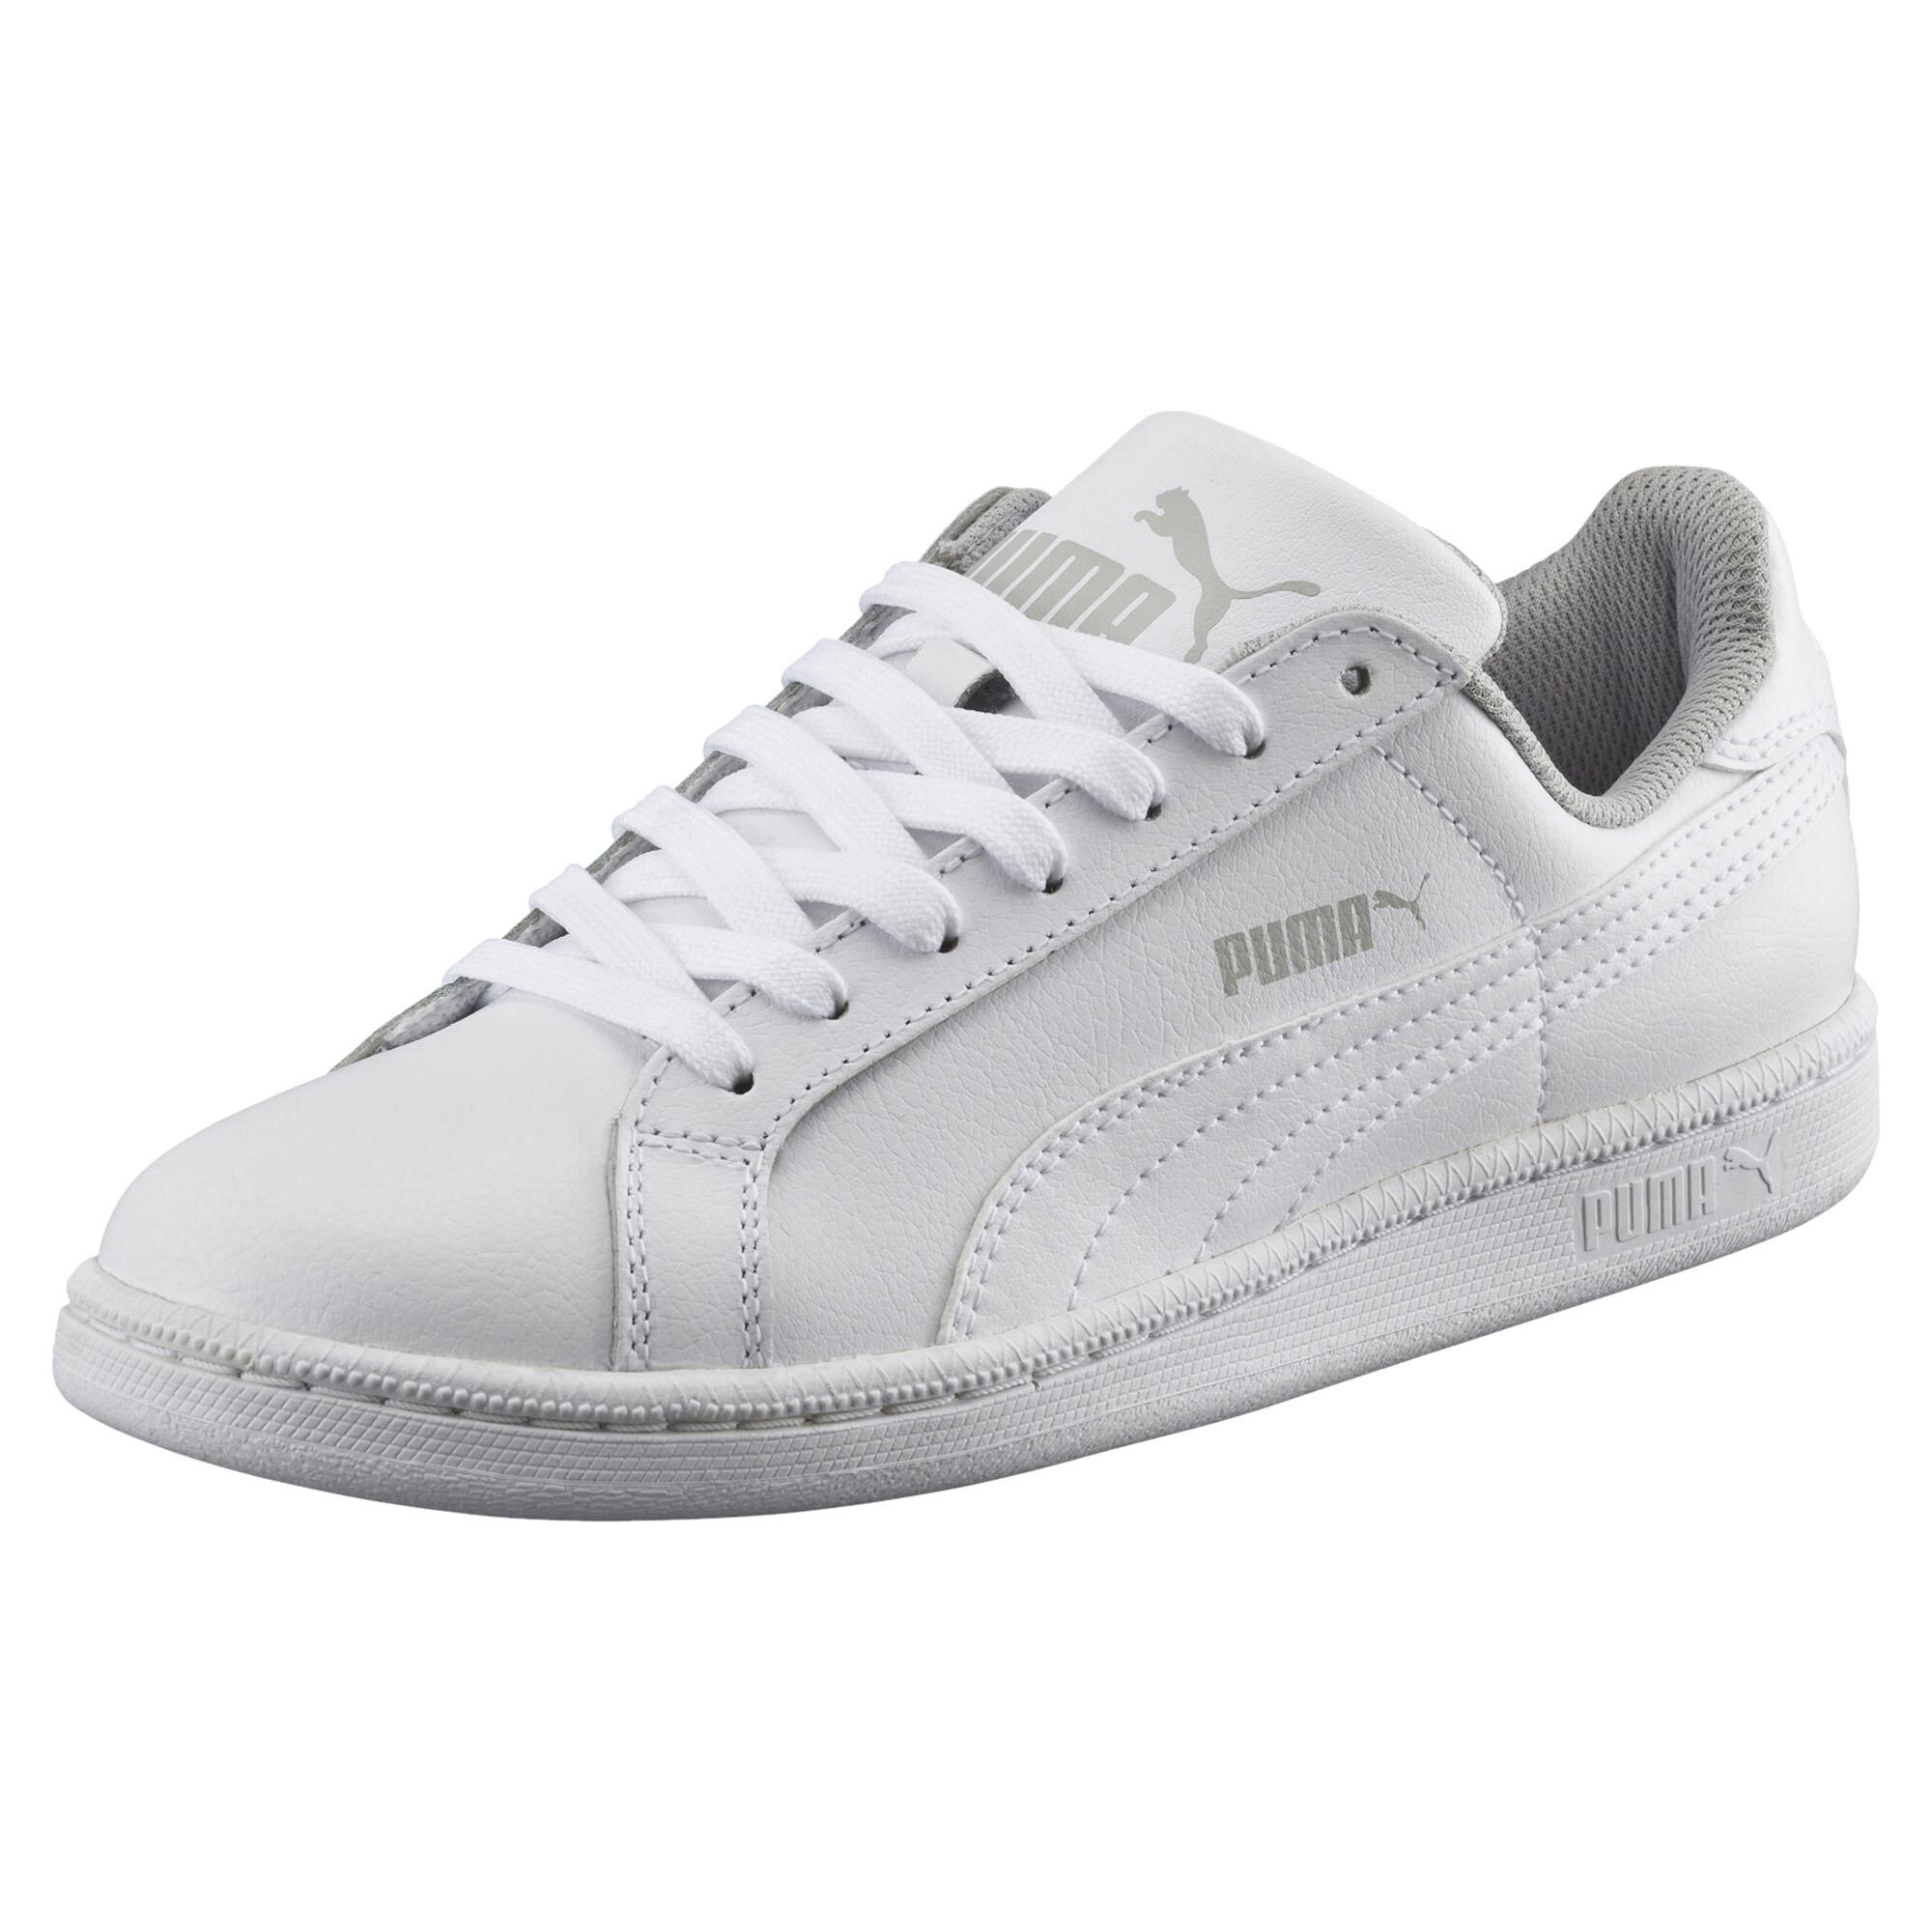 PUMA-Smash-Jr-Sneaker-Unisex-Schuhe-Kinder-Neu Indexbild 9